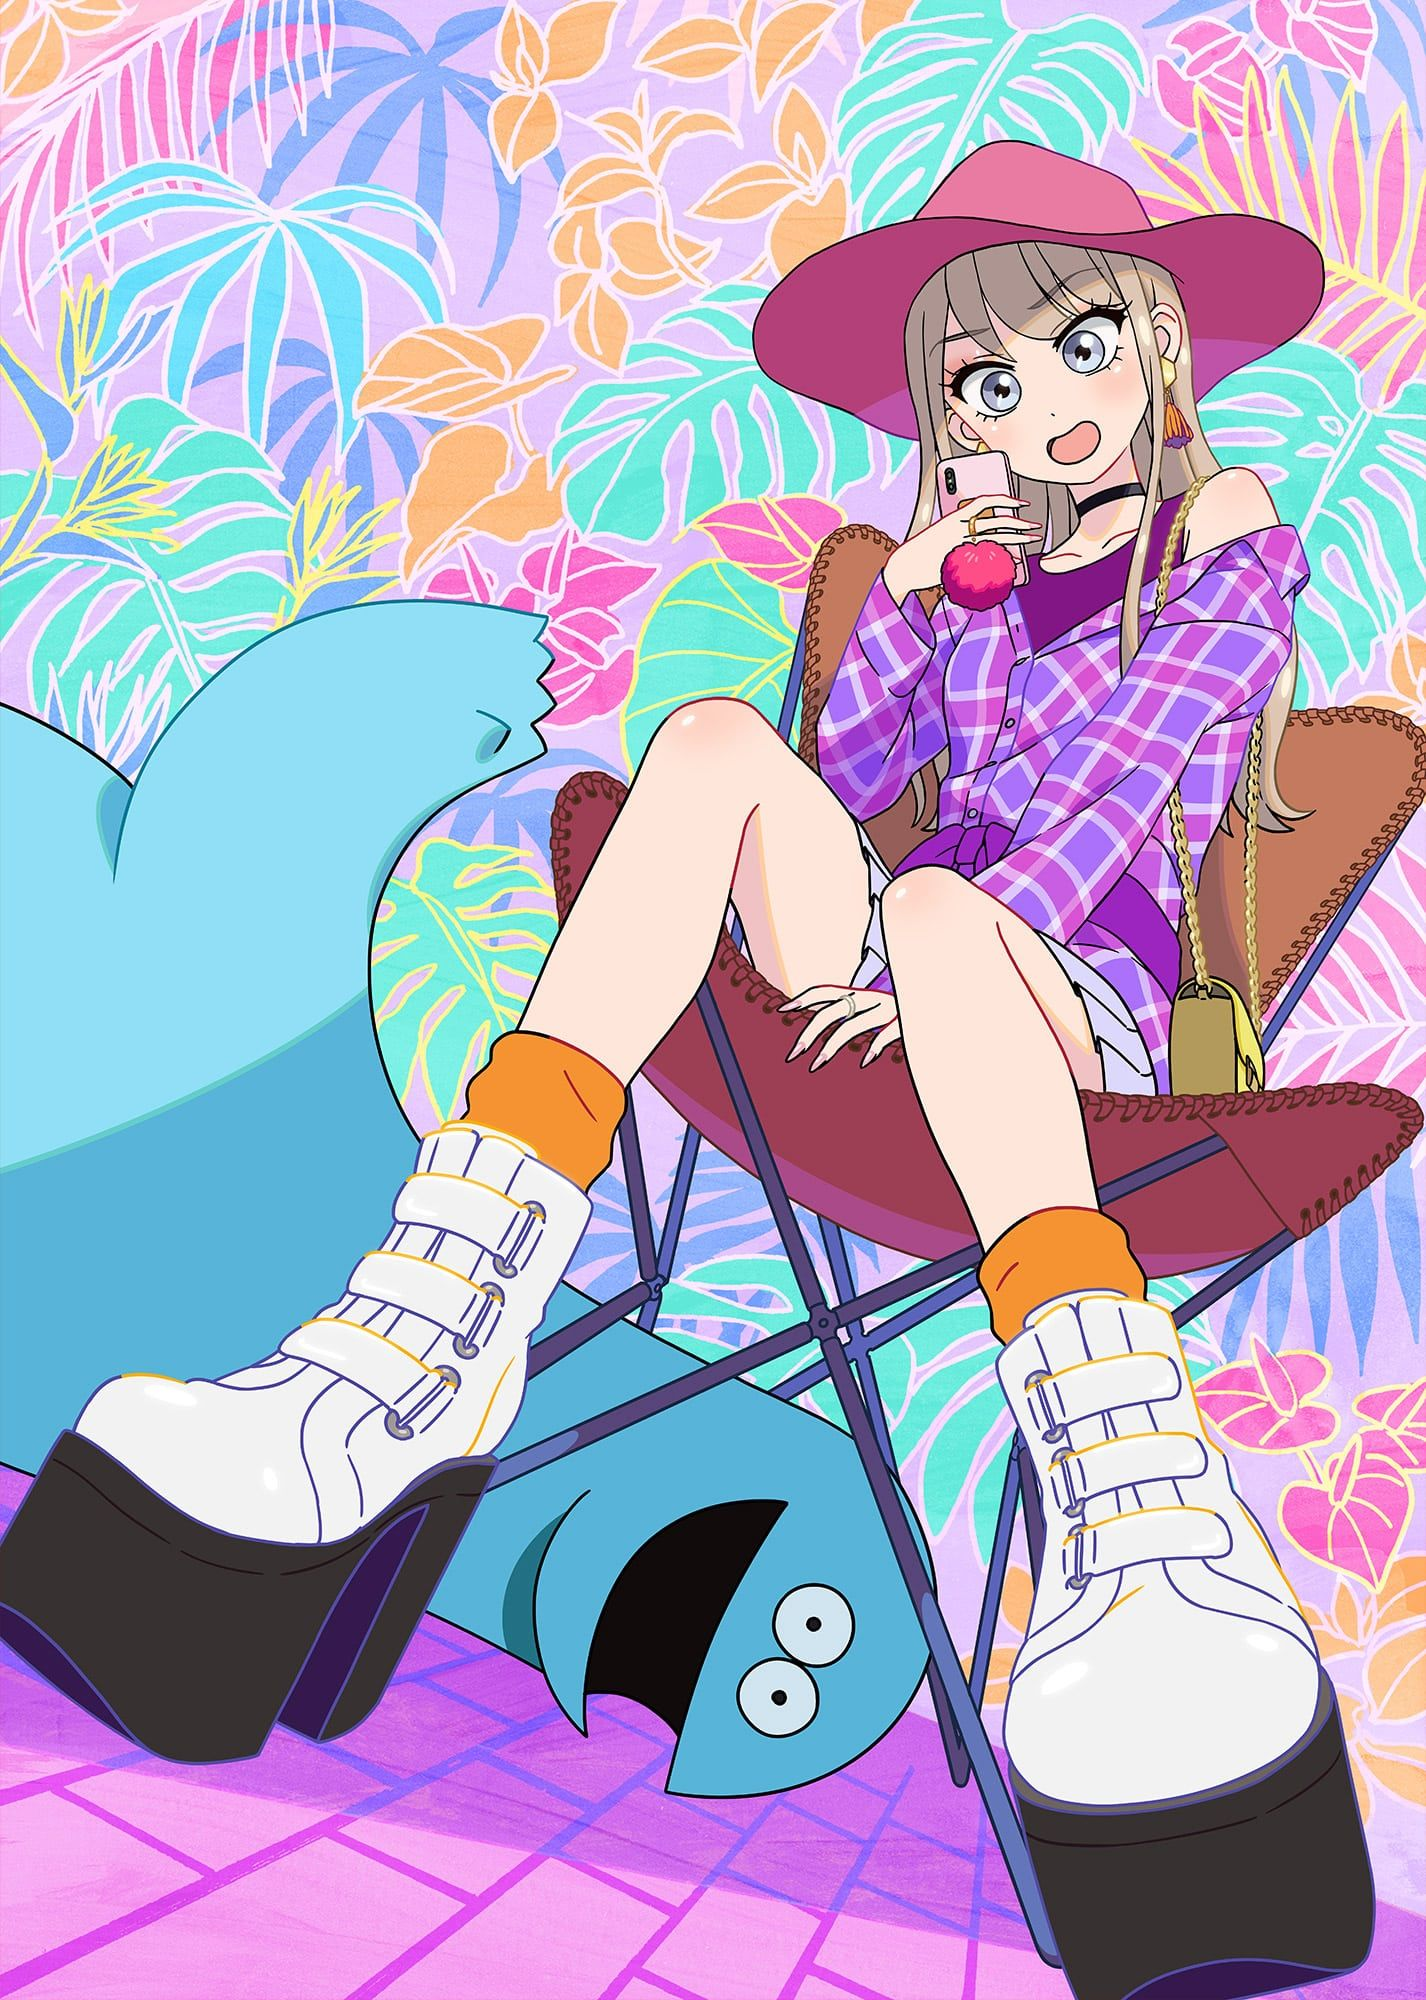 Gal to Kyouryuu 02 in 2020 anime, Anime